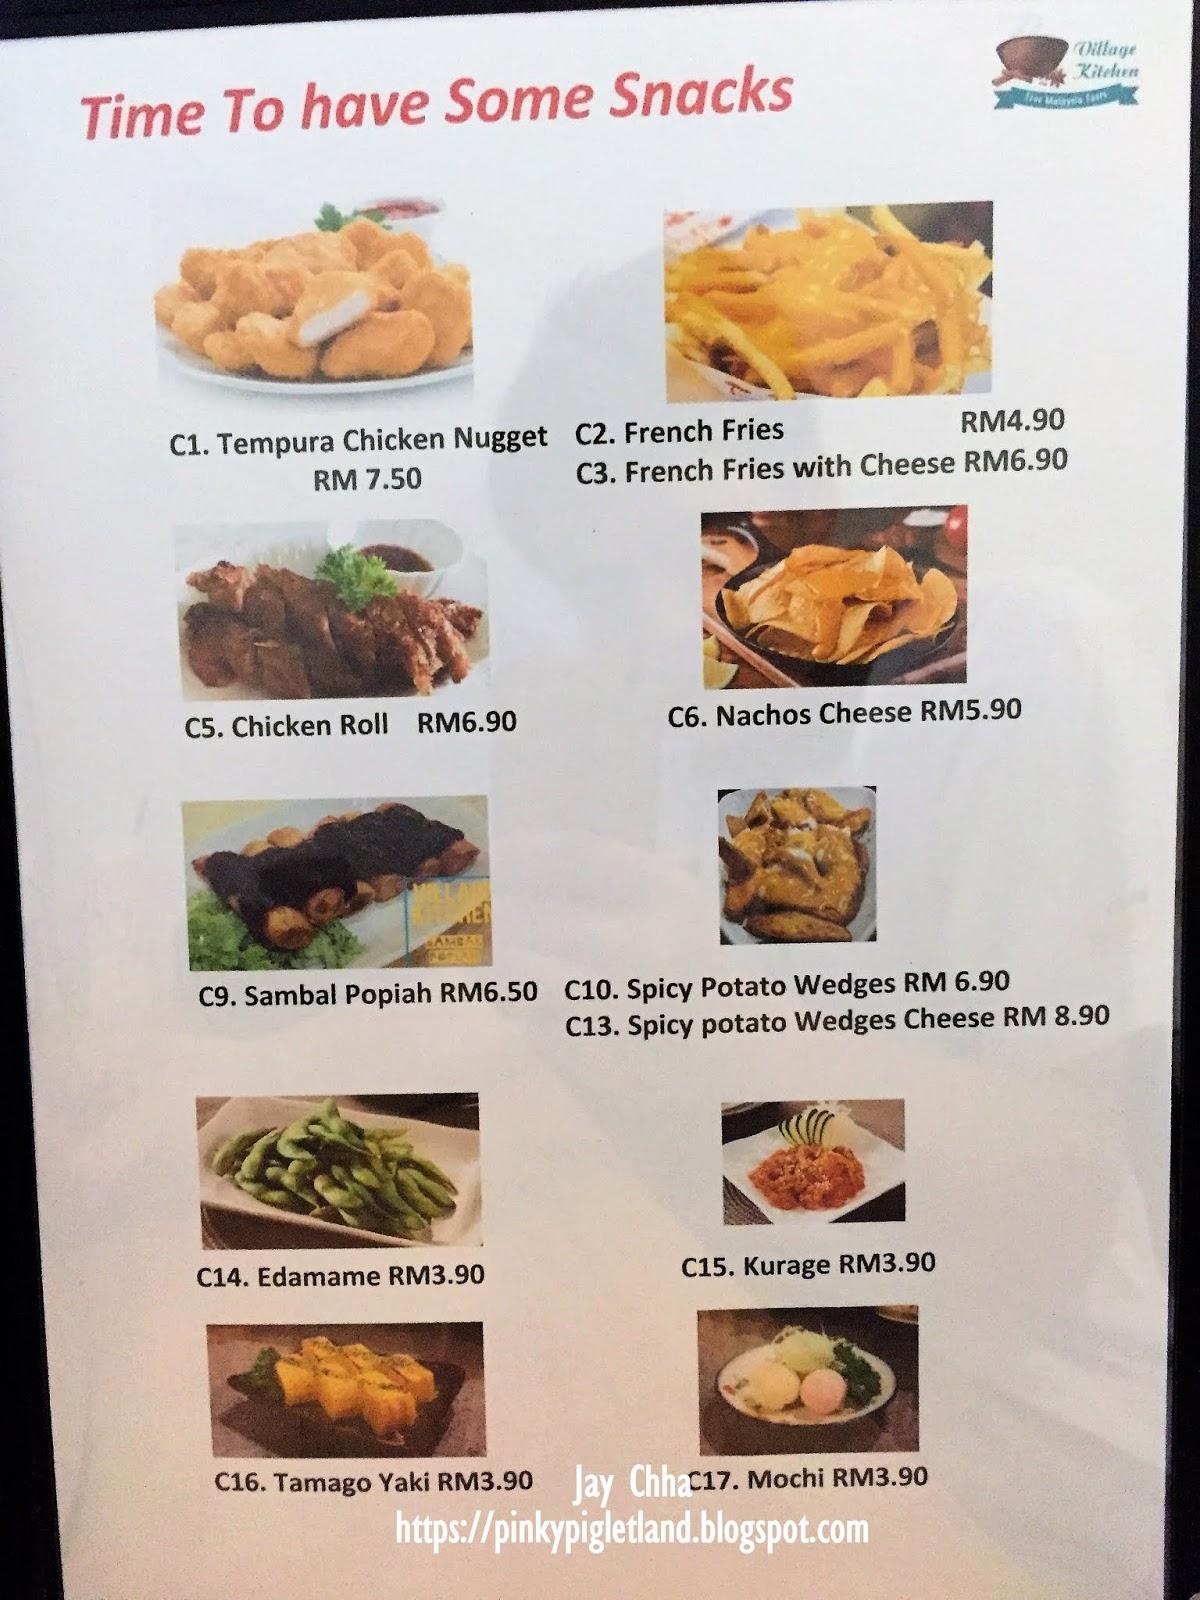 Village Kitchen Solaria Square Bayan Lepas Penang